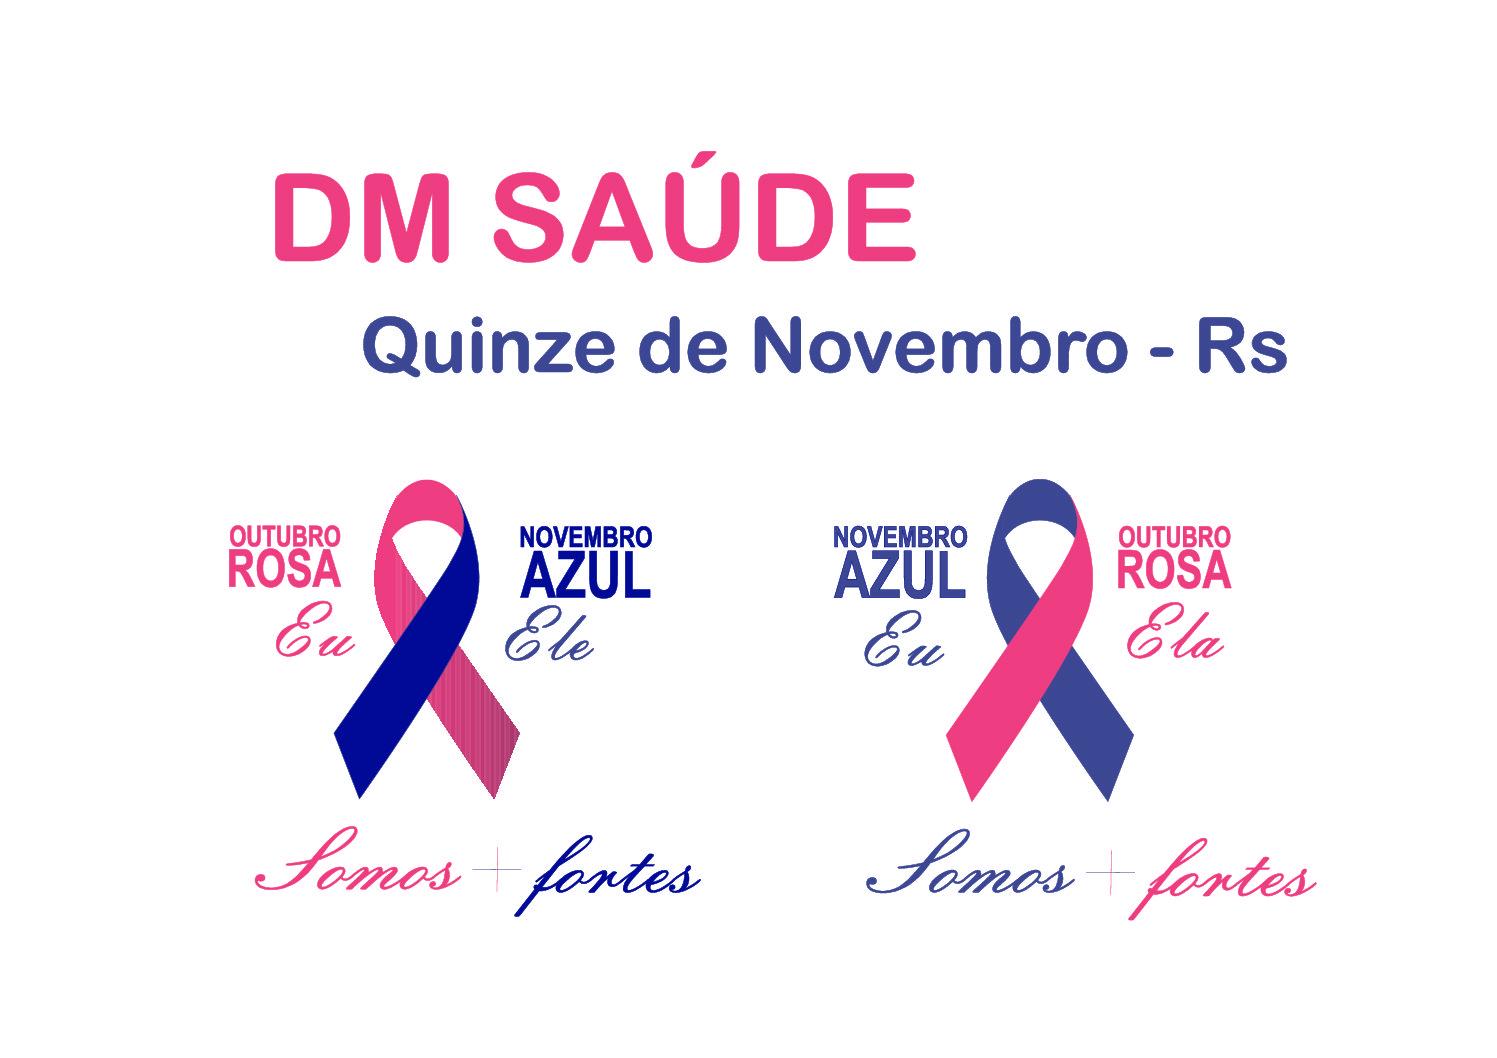 CAMISETAS PERSONALIZADAS PARA CAMPANHAS OUTUBRO ROSA E NOVEMBRO AZUL DA CIDADE DE QUINZE DE NOVEMBRO/RS.